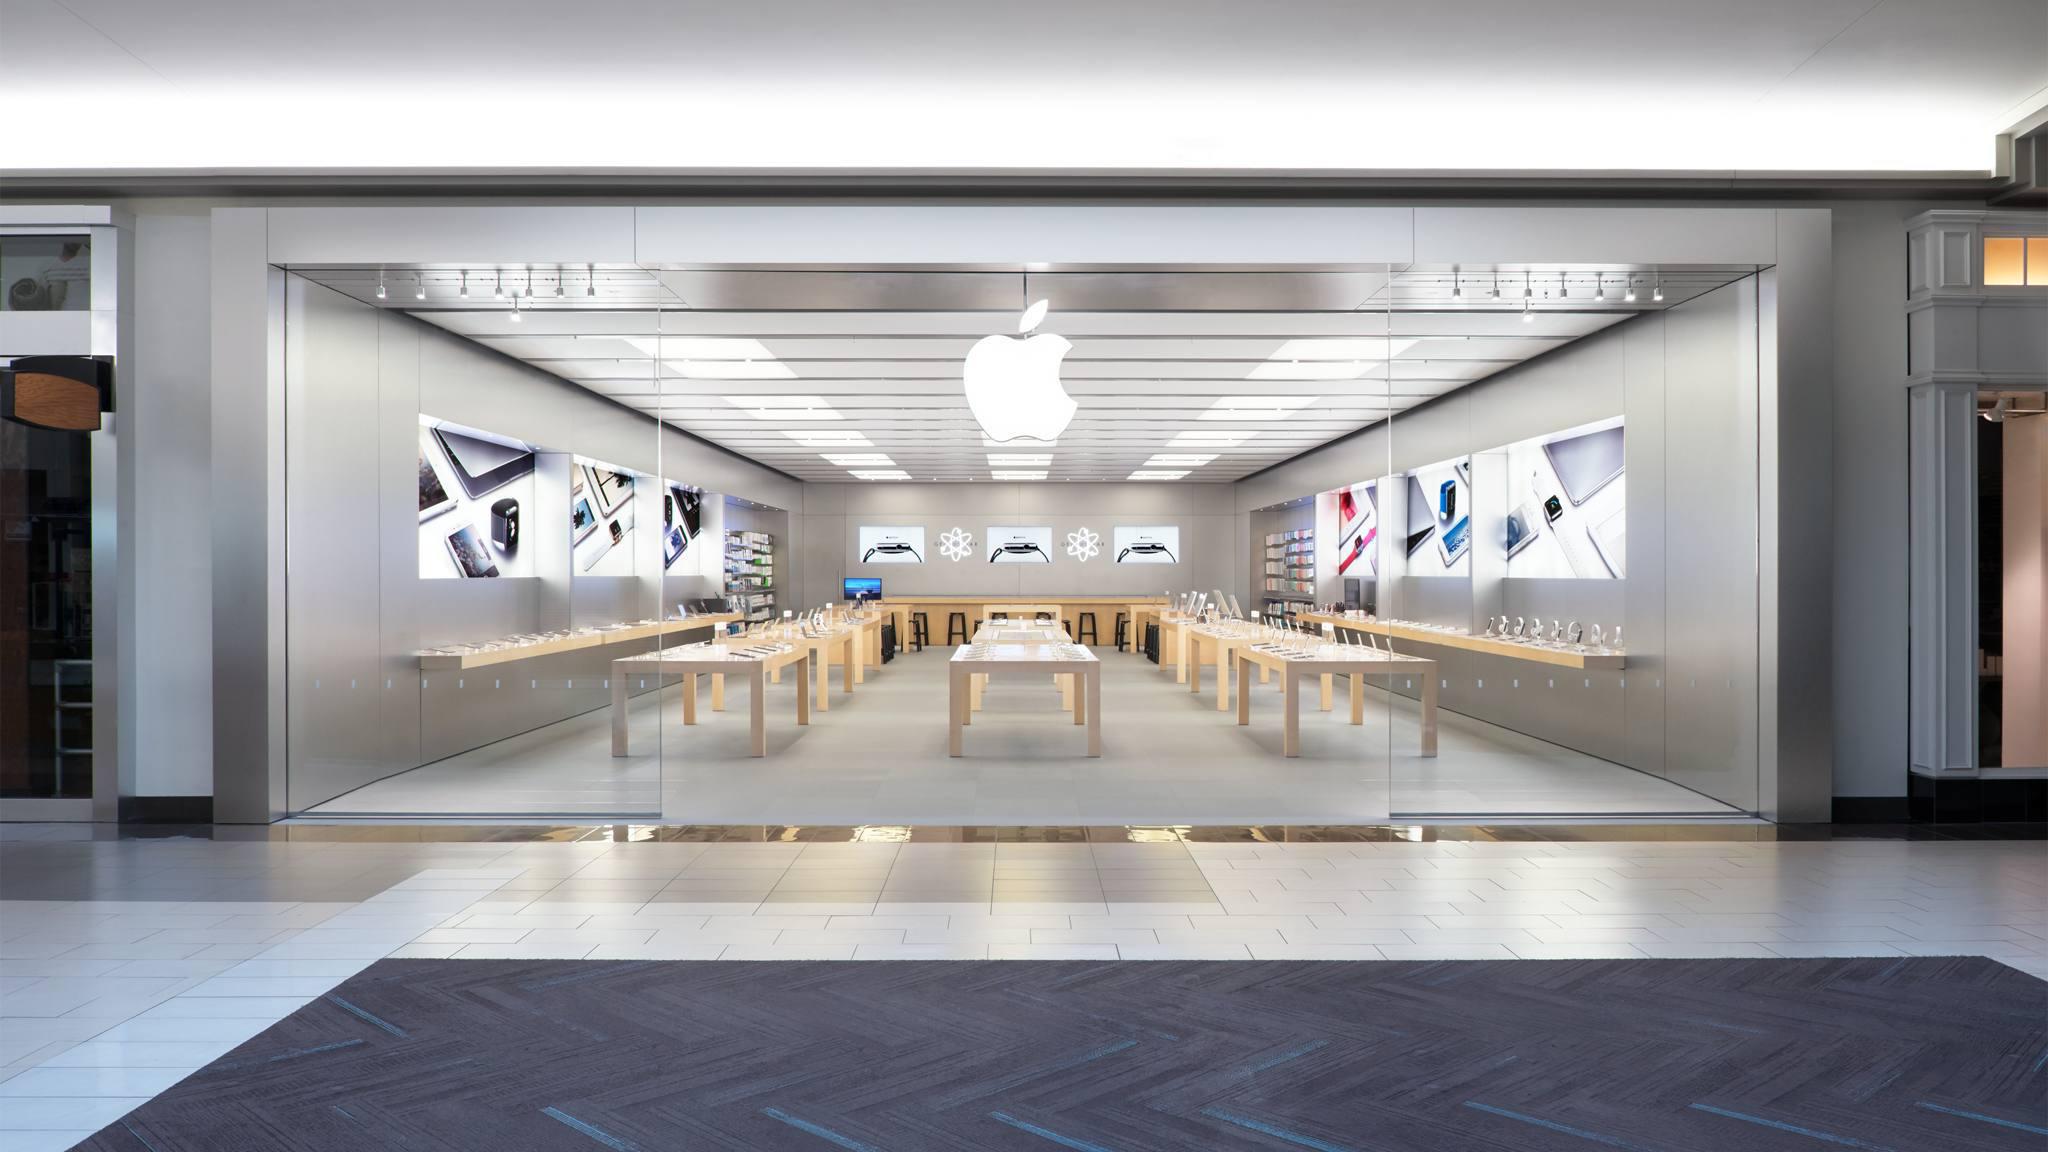 Apple University Park Mall image 0